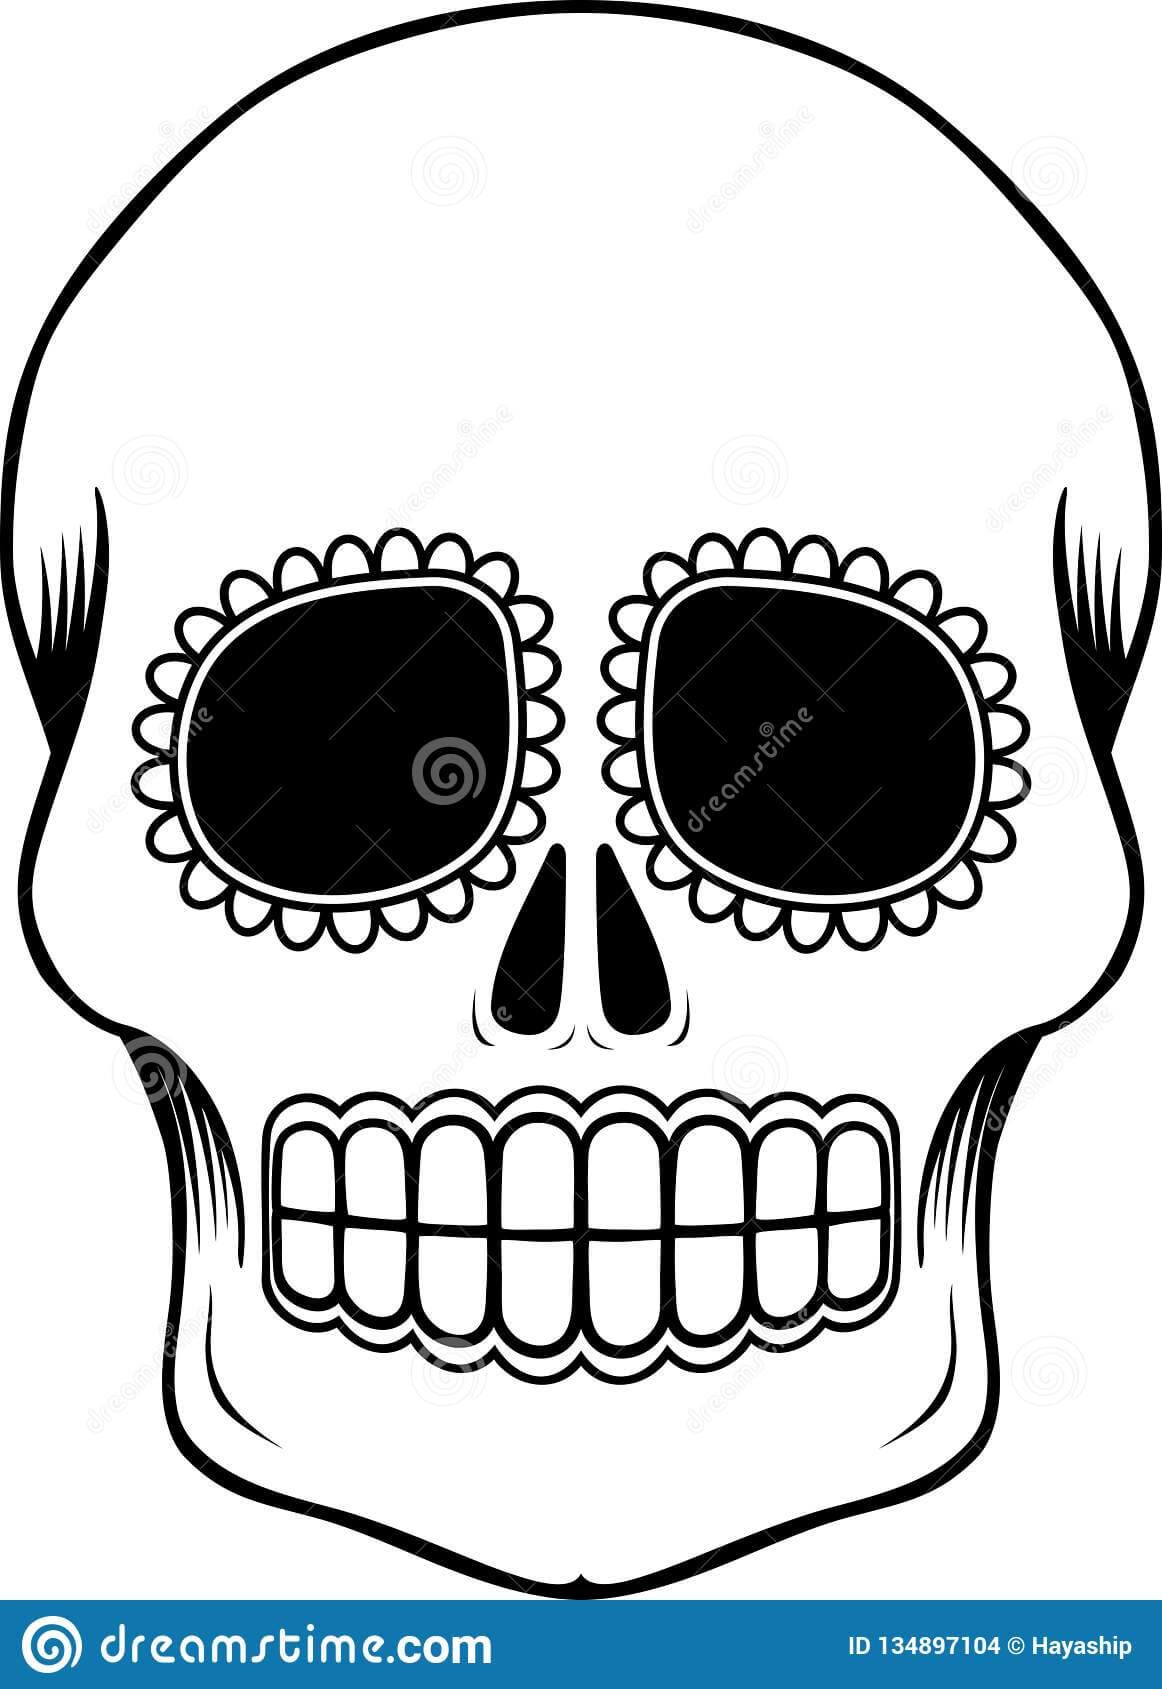 Mexican Sugar Skull Template Stock Vector - Illustration Of Regarding Blank Sugar Skull Template